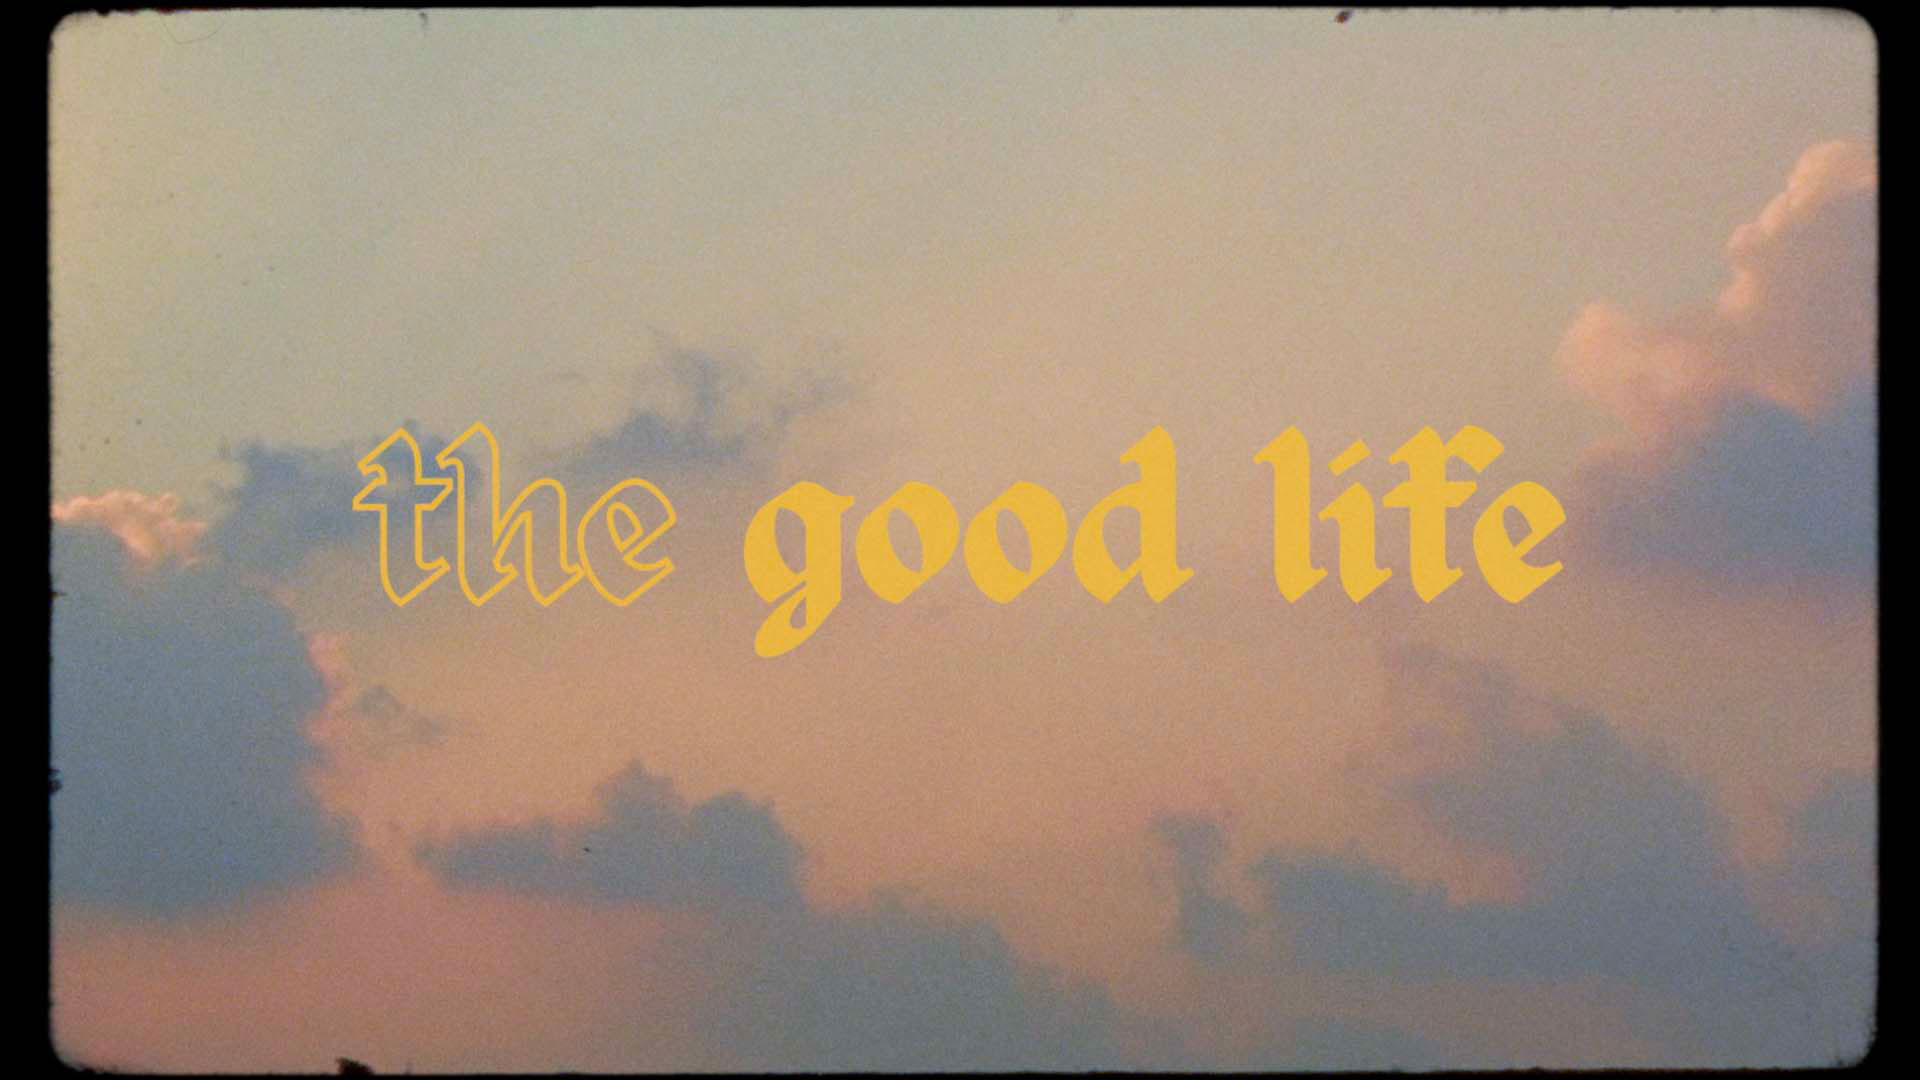 Series: The Good Life